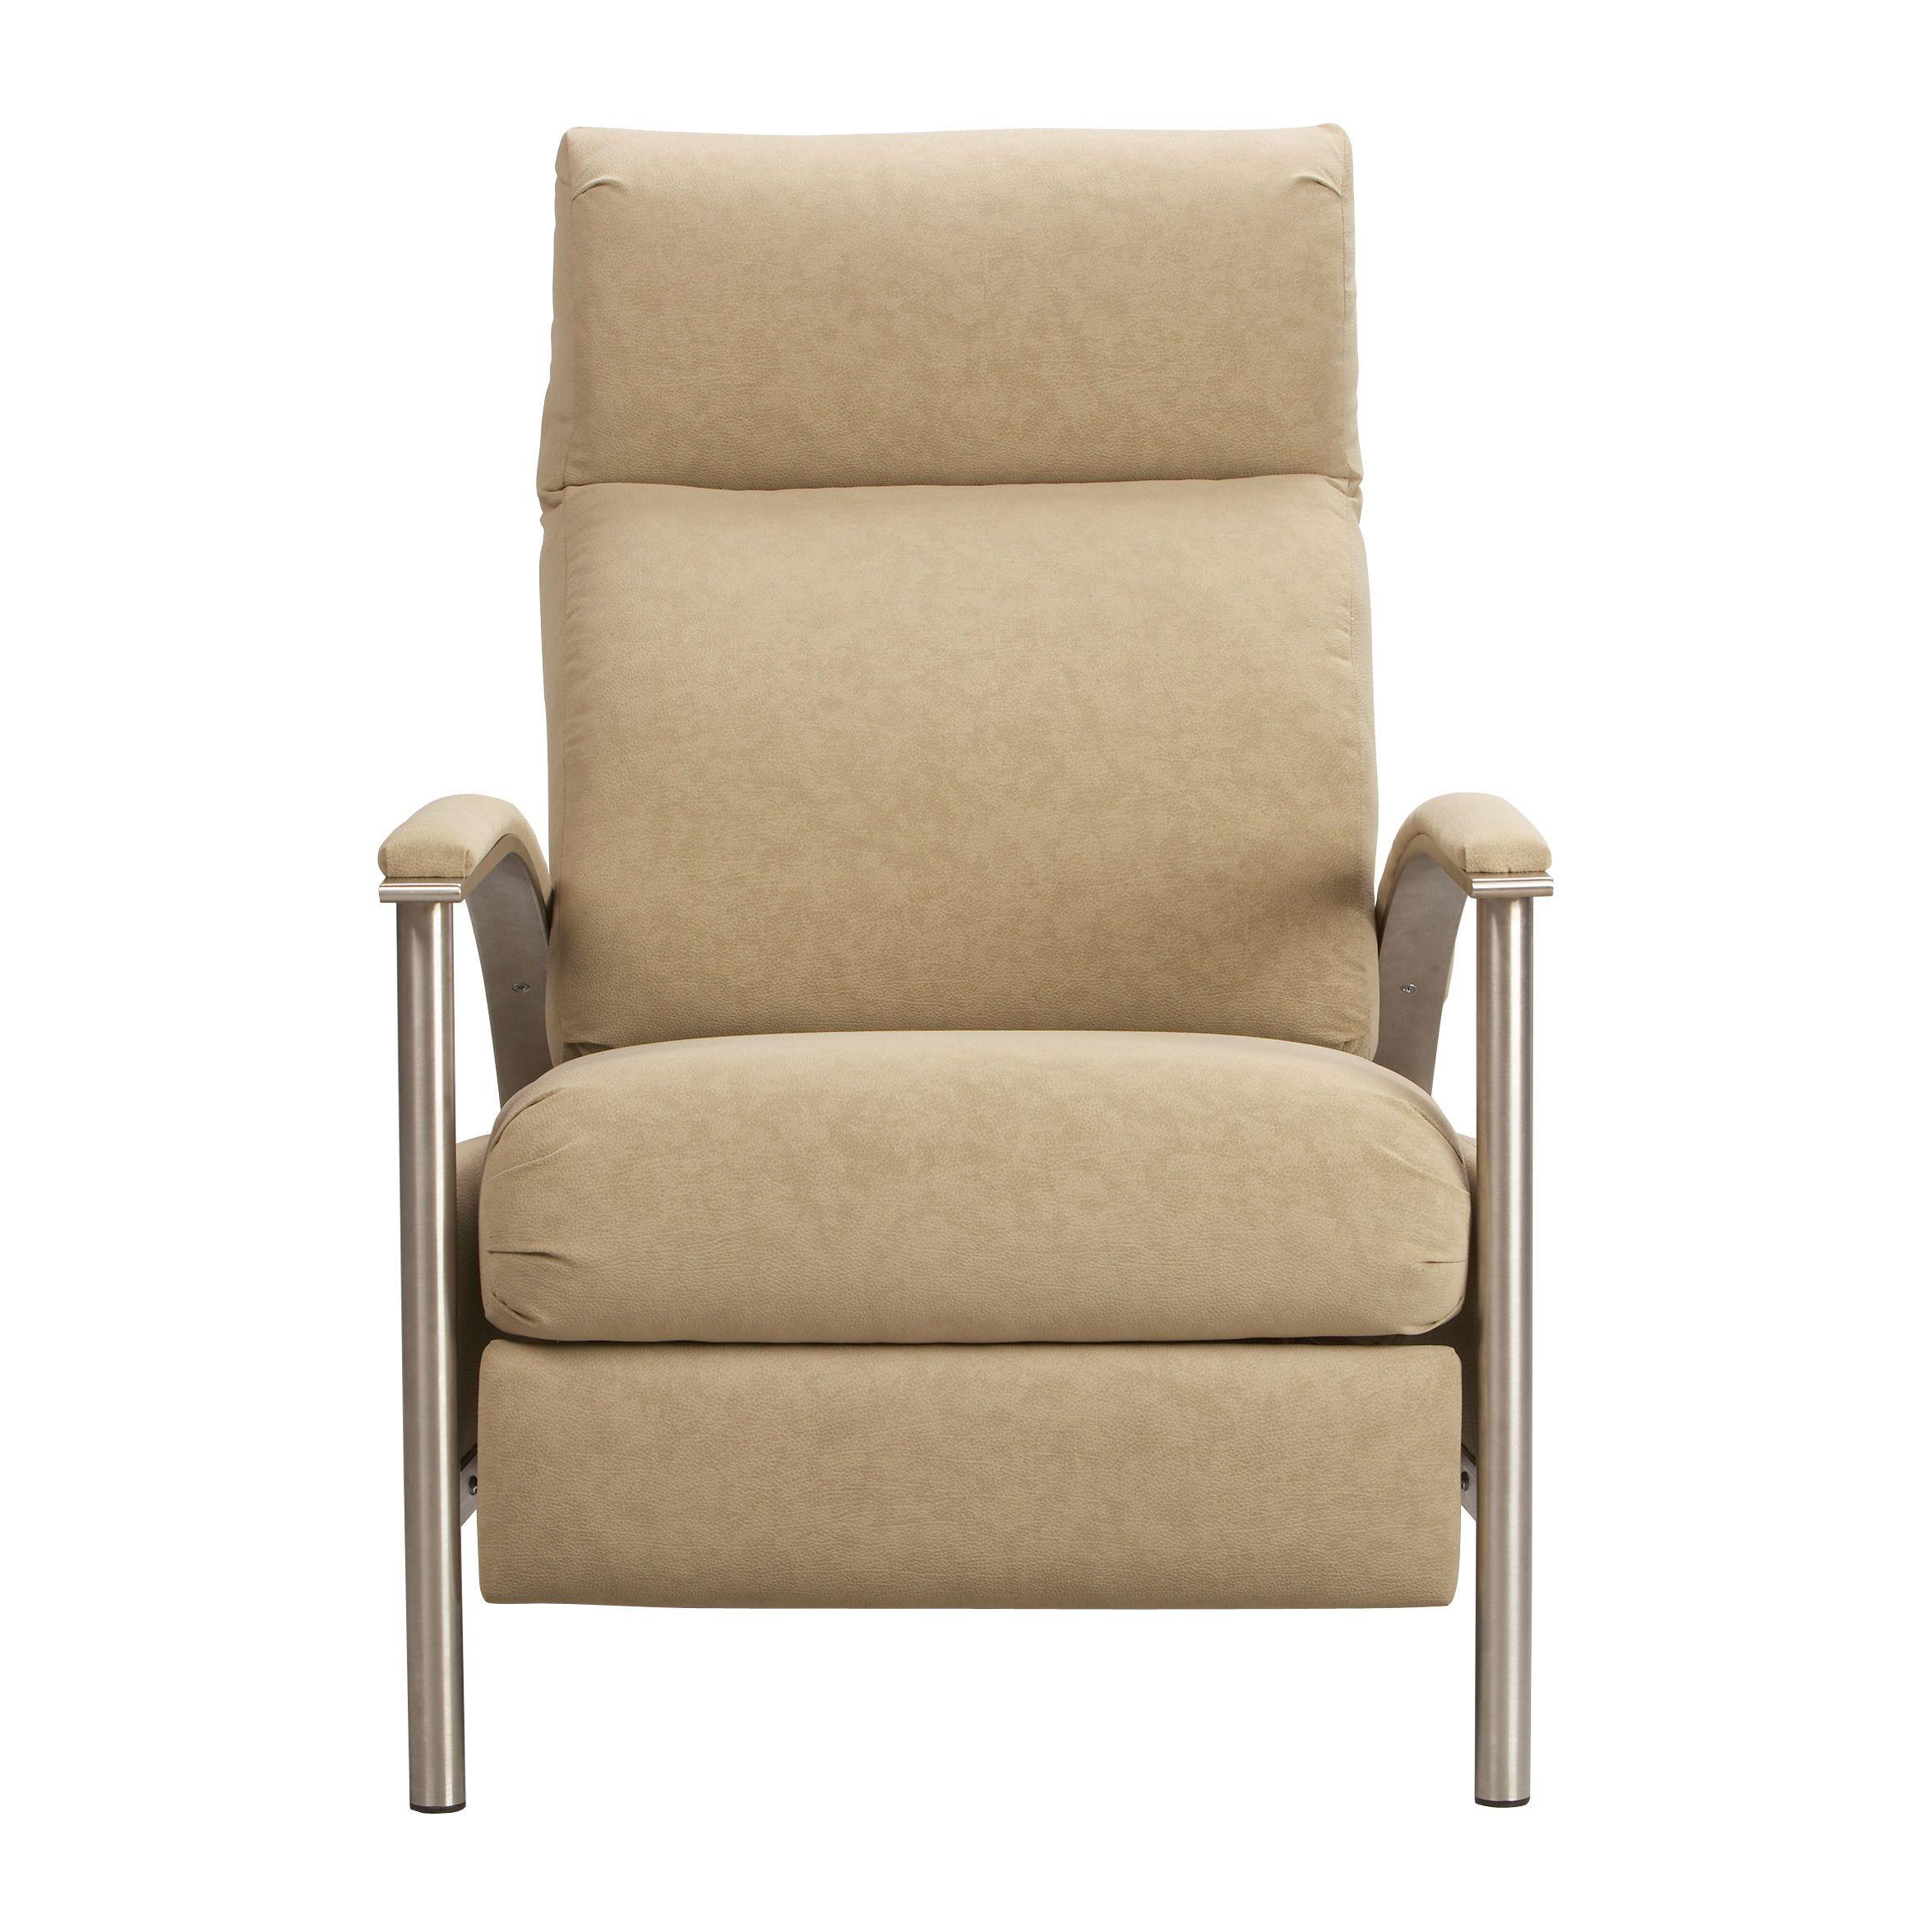 Fantastic Linear Recliner Ethan Allen Us Furniture Furniture For Short Links Chair Design For Home Short Linksinfo